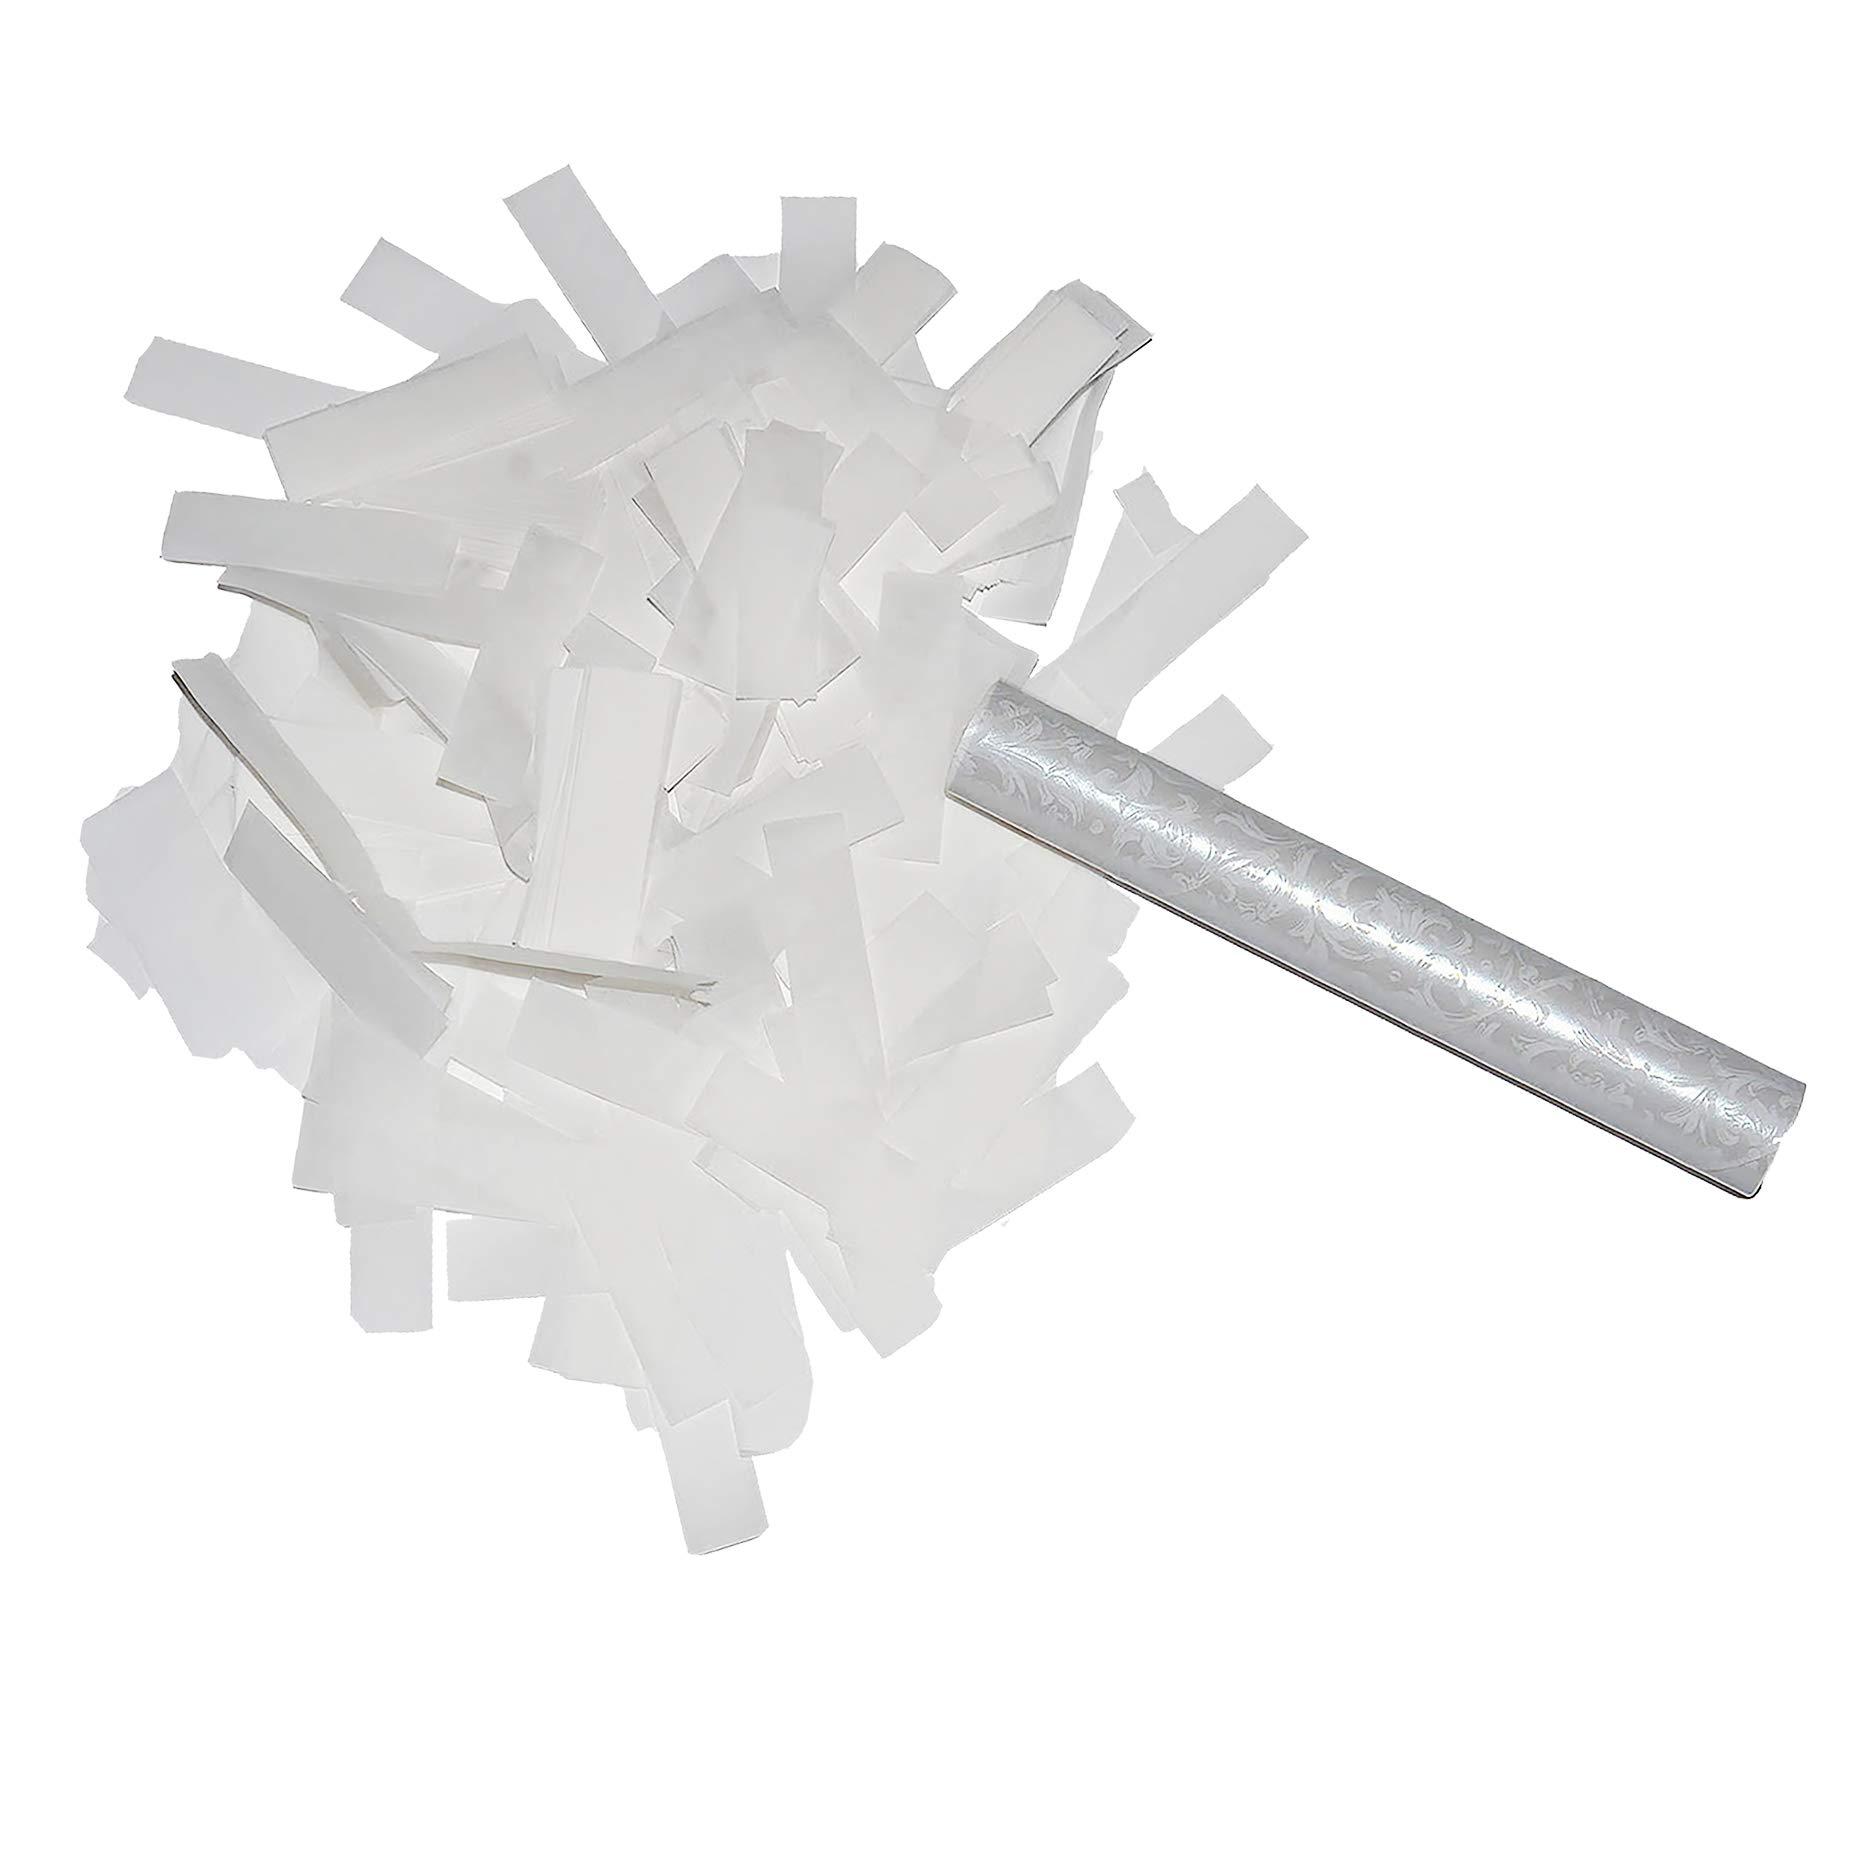 Flutter FETTI White Paper Tissue Wedding Confetti Stick Hand Flick Launcher Biodegradable (Eco-Friendly) 6inch- 10 Pack